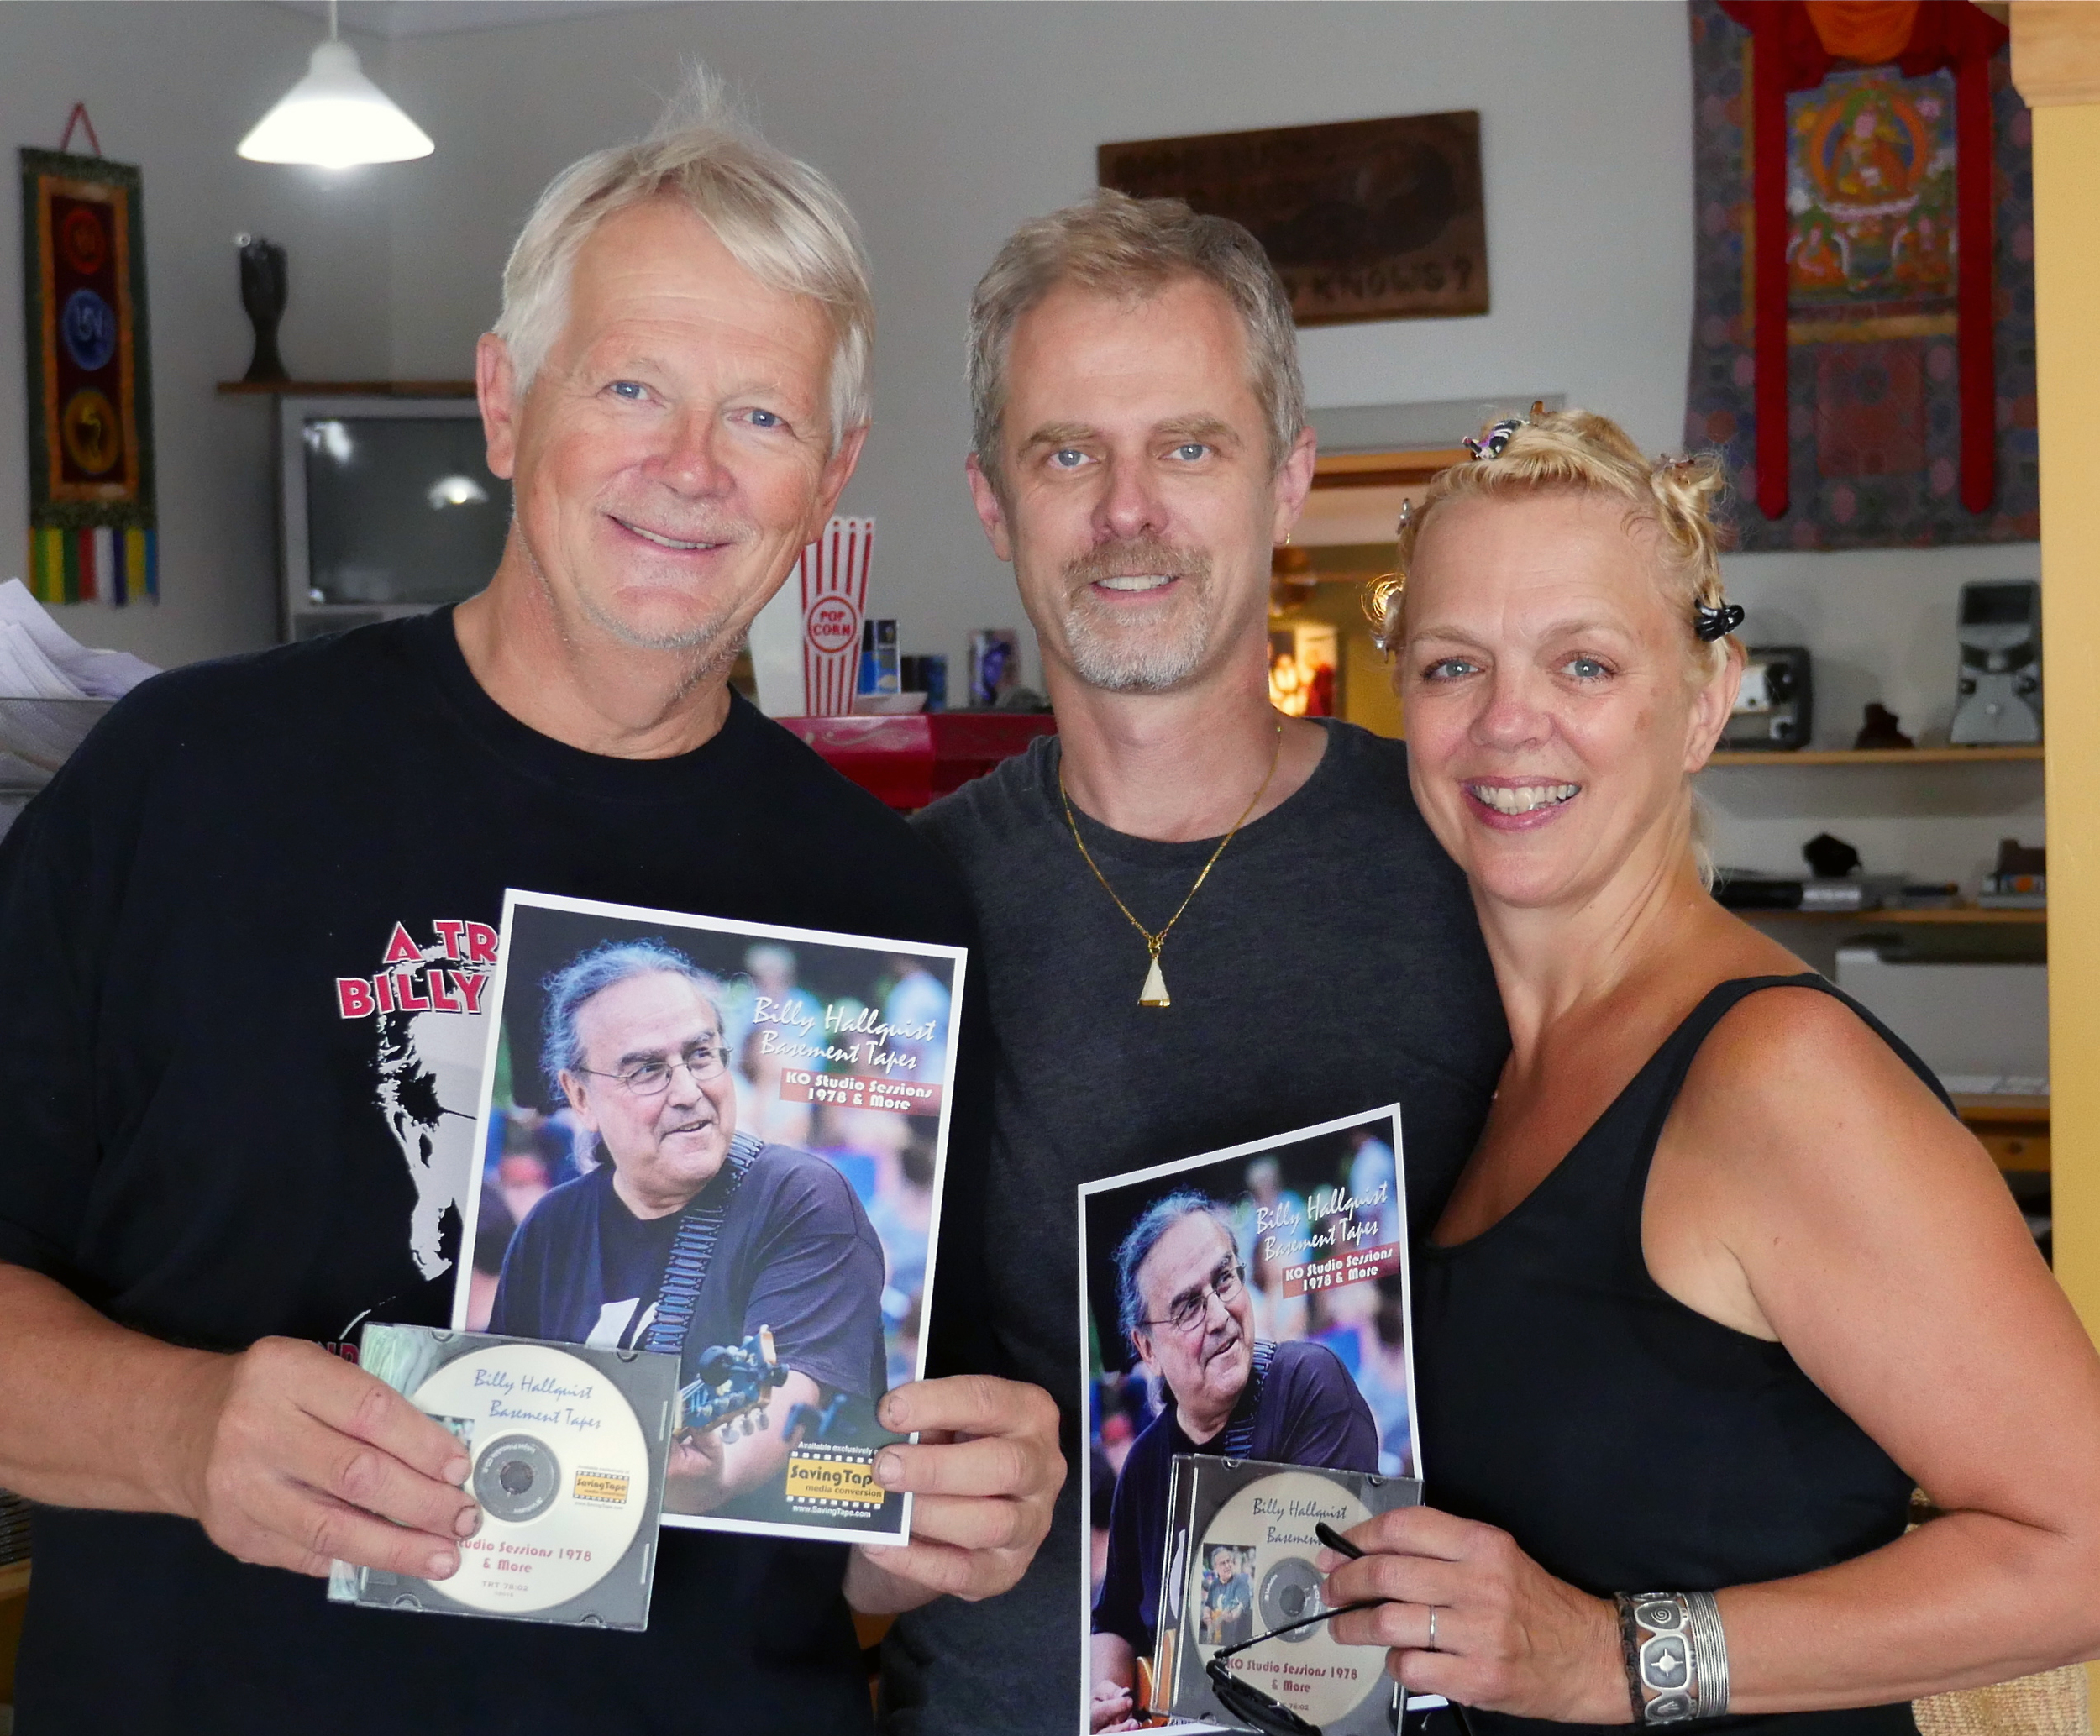 Billy Hallquist Basement Tapes -Thomas Thompson, Thor Anderson and Barbara Meyer / Saving Tape  / Minneapolis, Minnesota / August 1st, 2016